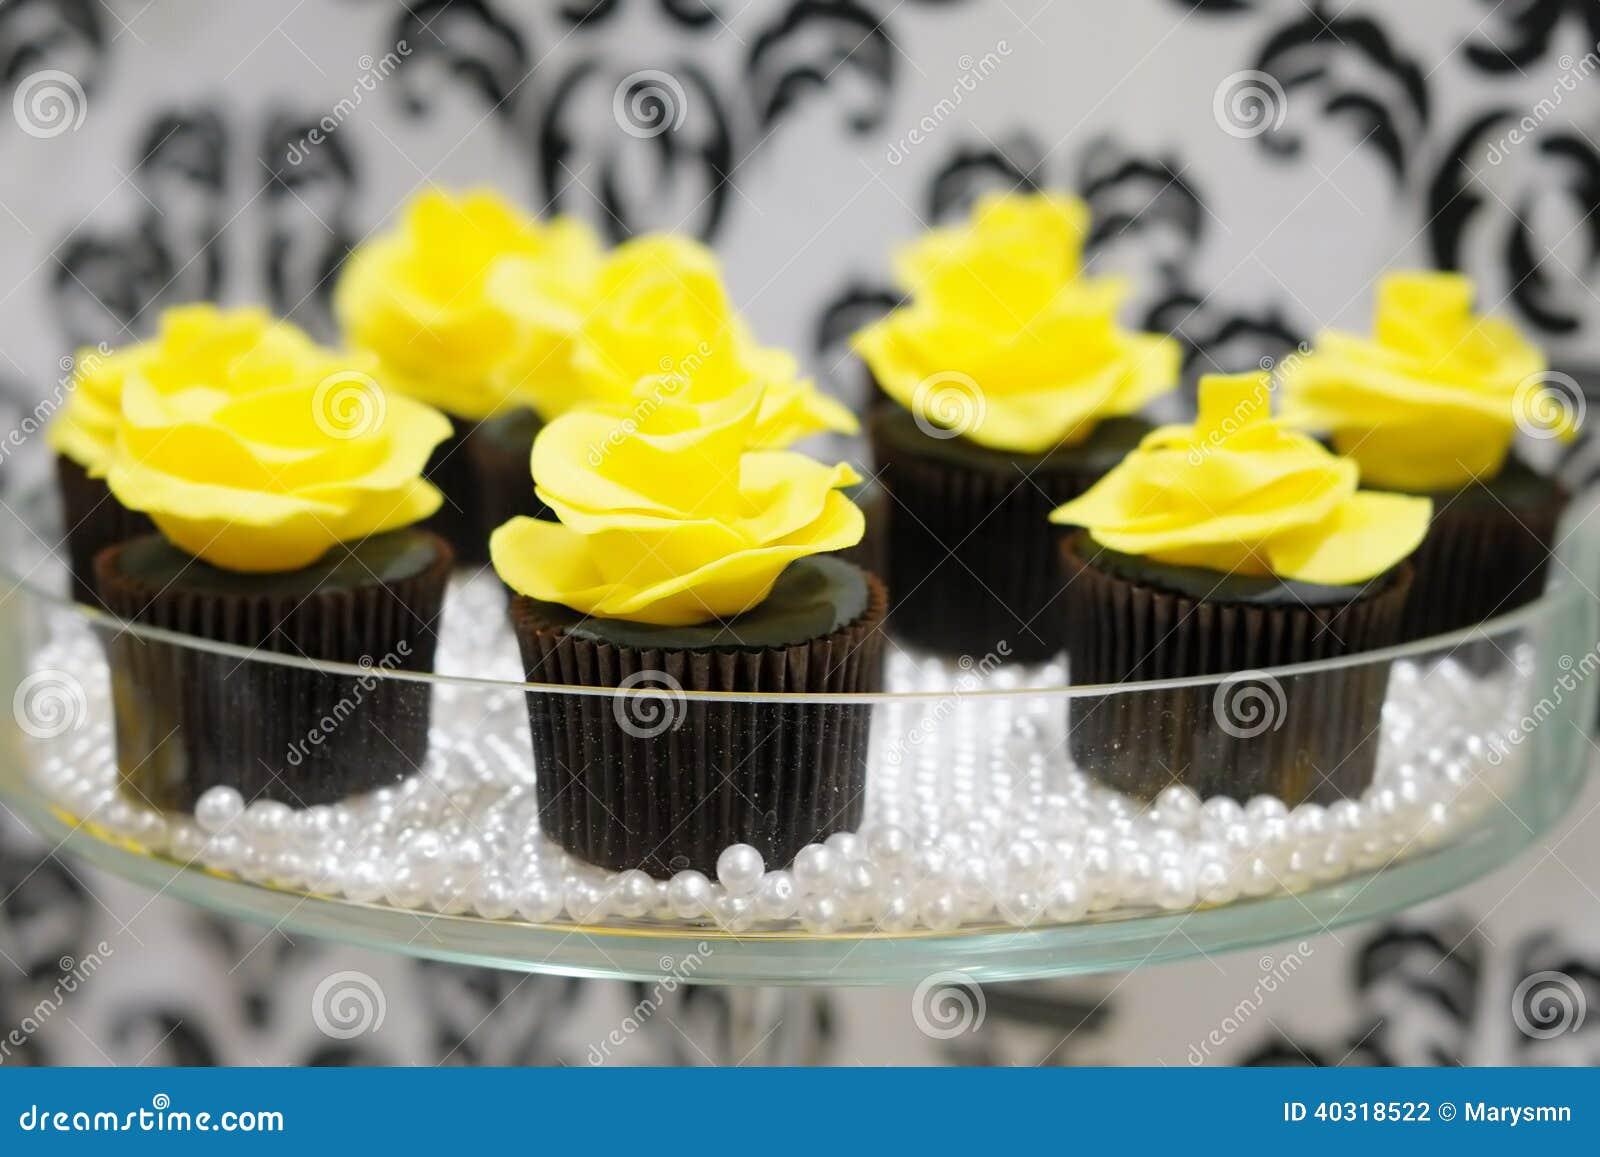 Black And Yellow Cupcakes Stock Photo Image 40318522